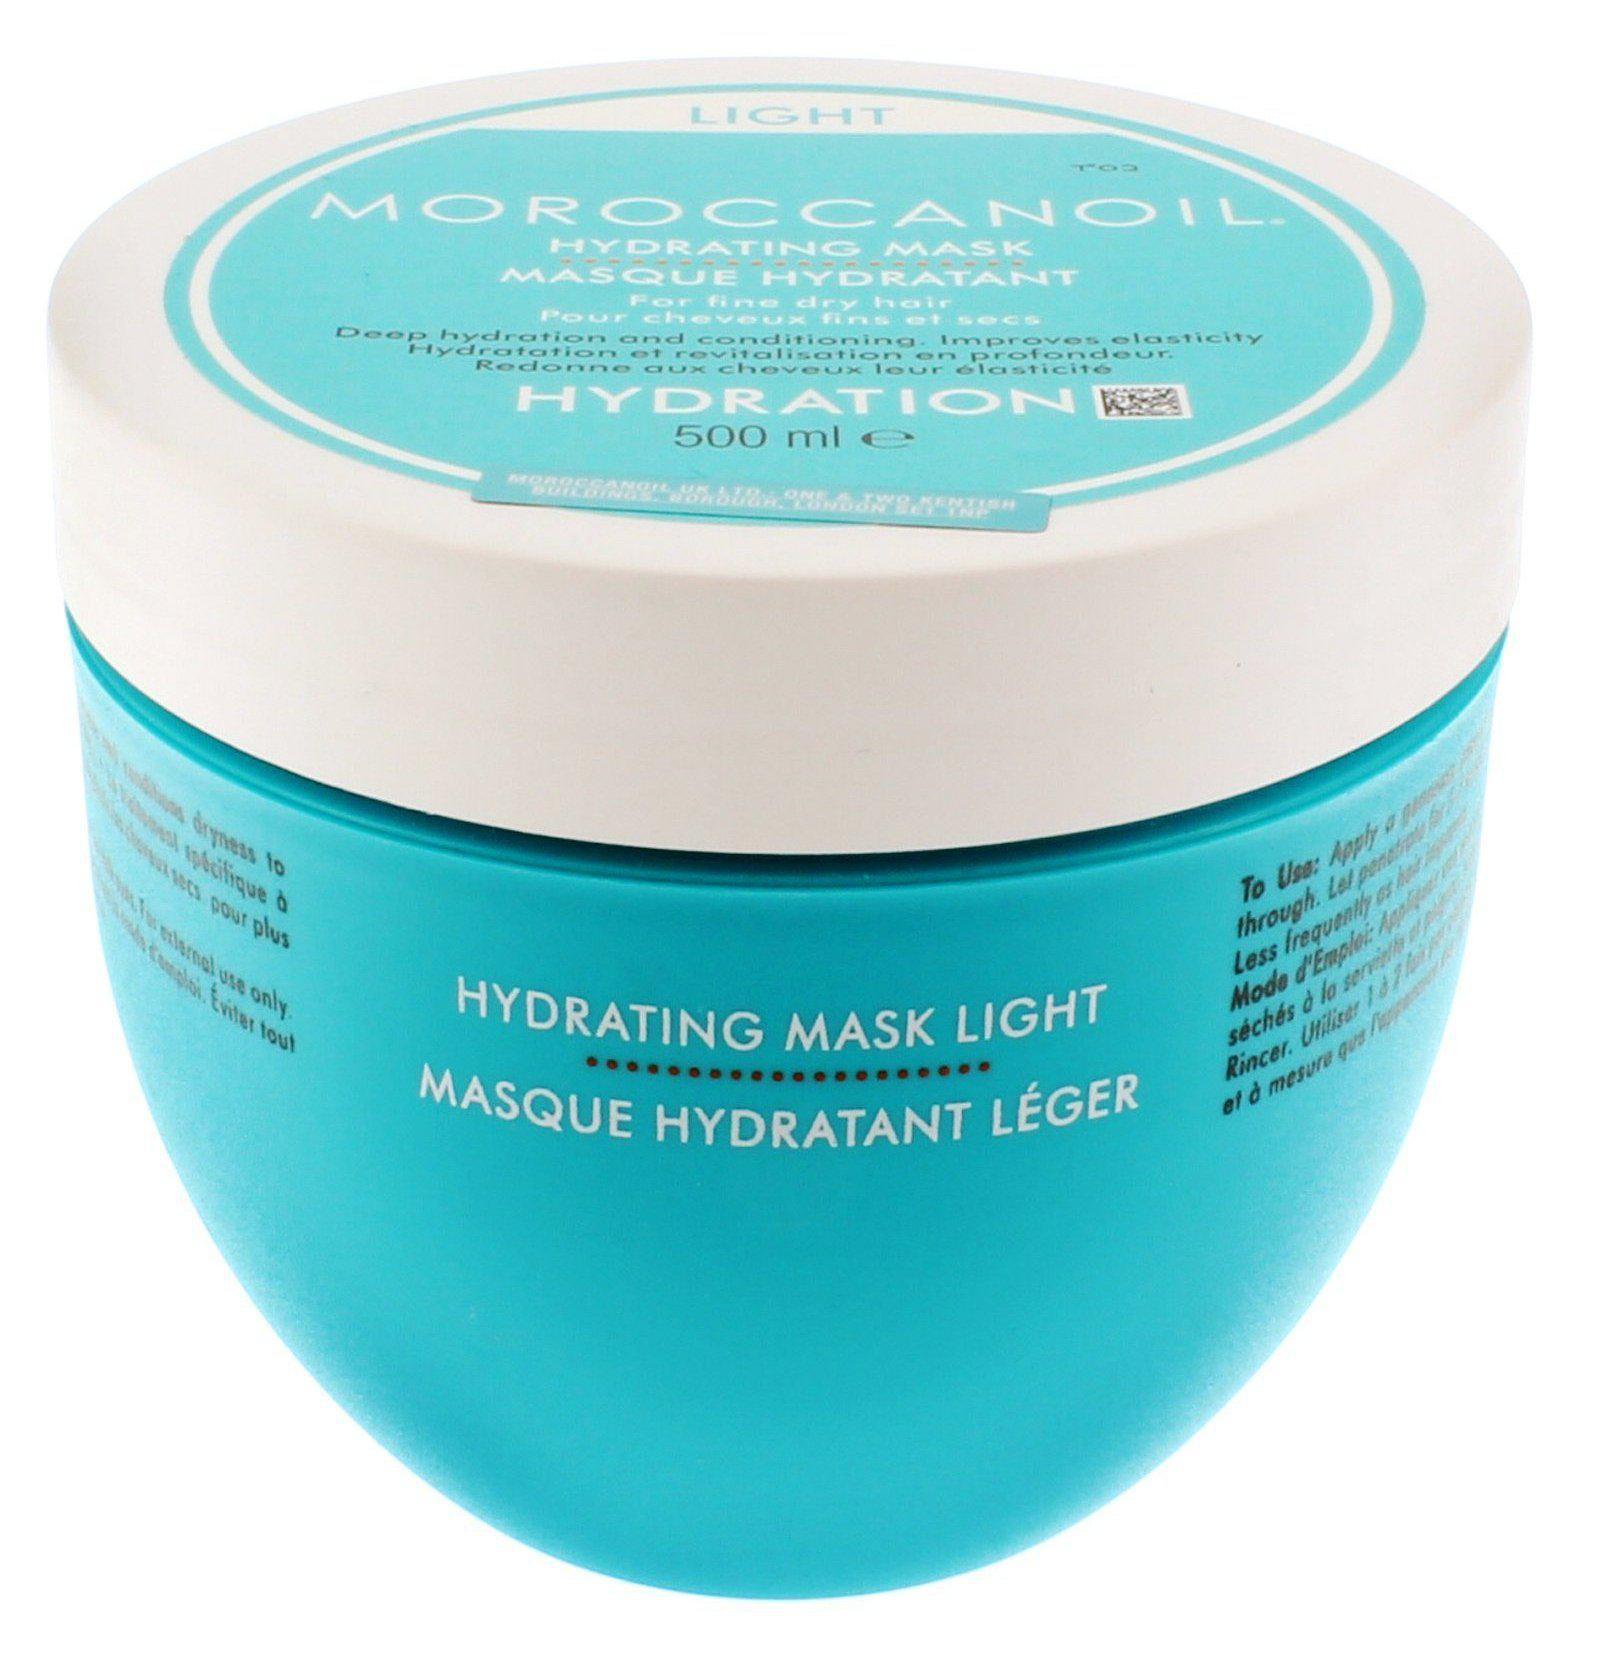 Moroccanoil Light Hydrating Mask...